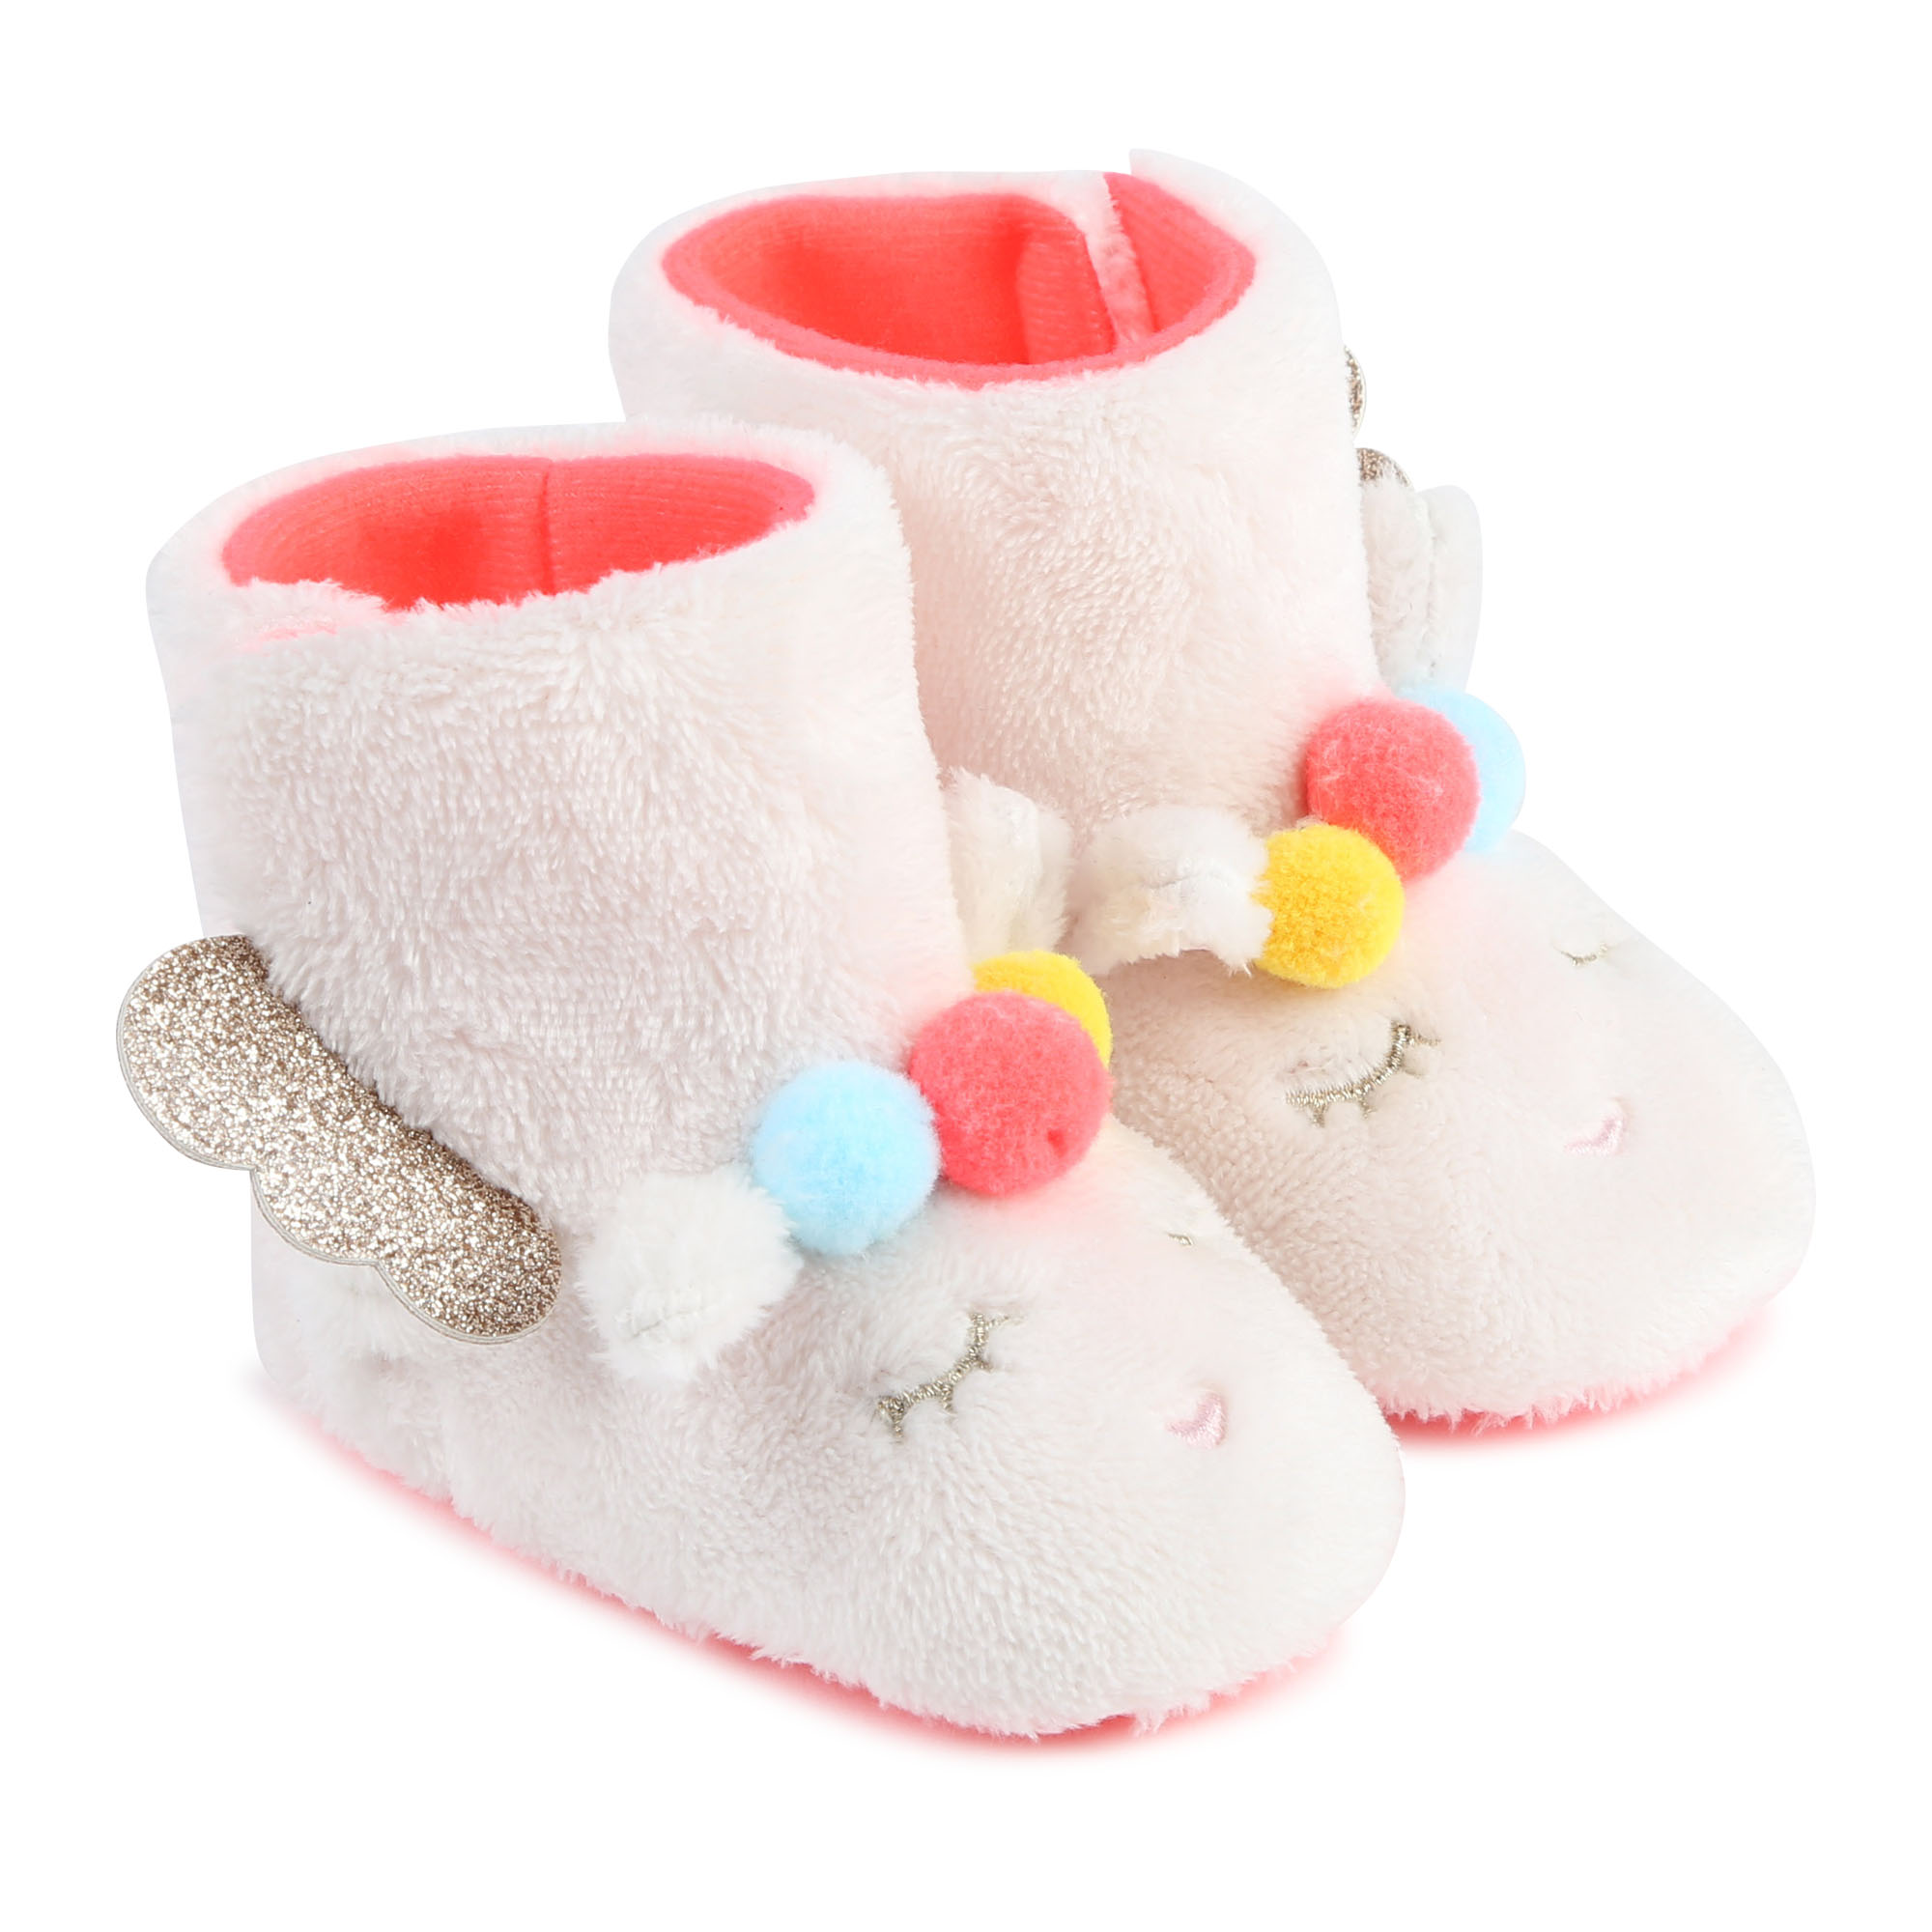 Billieblush yksisarvis vauva saappaat ALE -50% (OVH 39€)